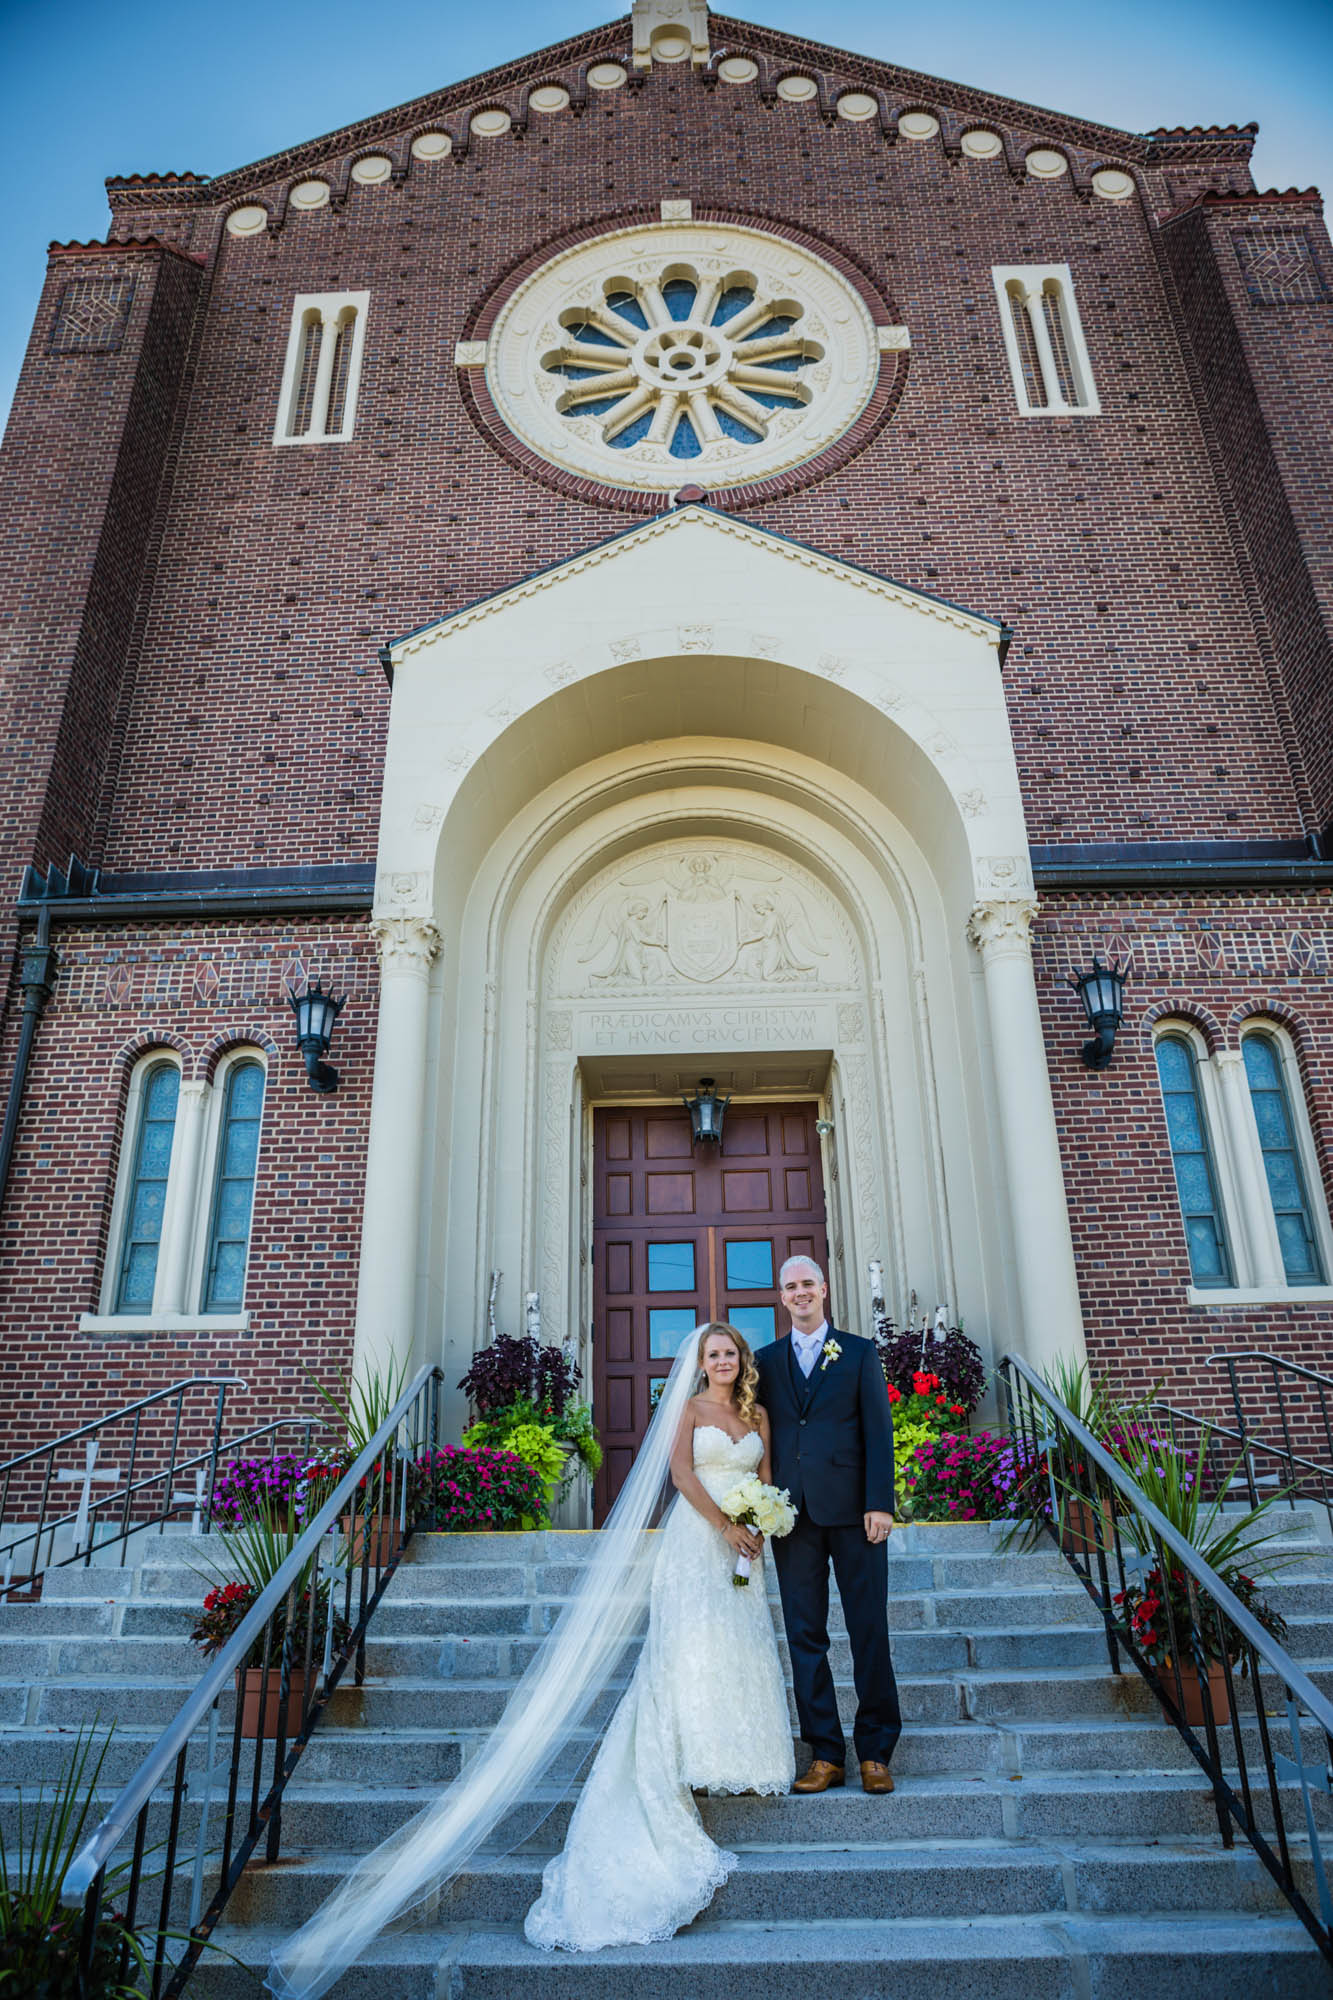 scranton_wedding_photographer_lettieri_pa (13 of 47).jpg